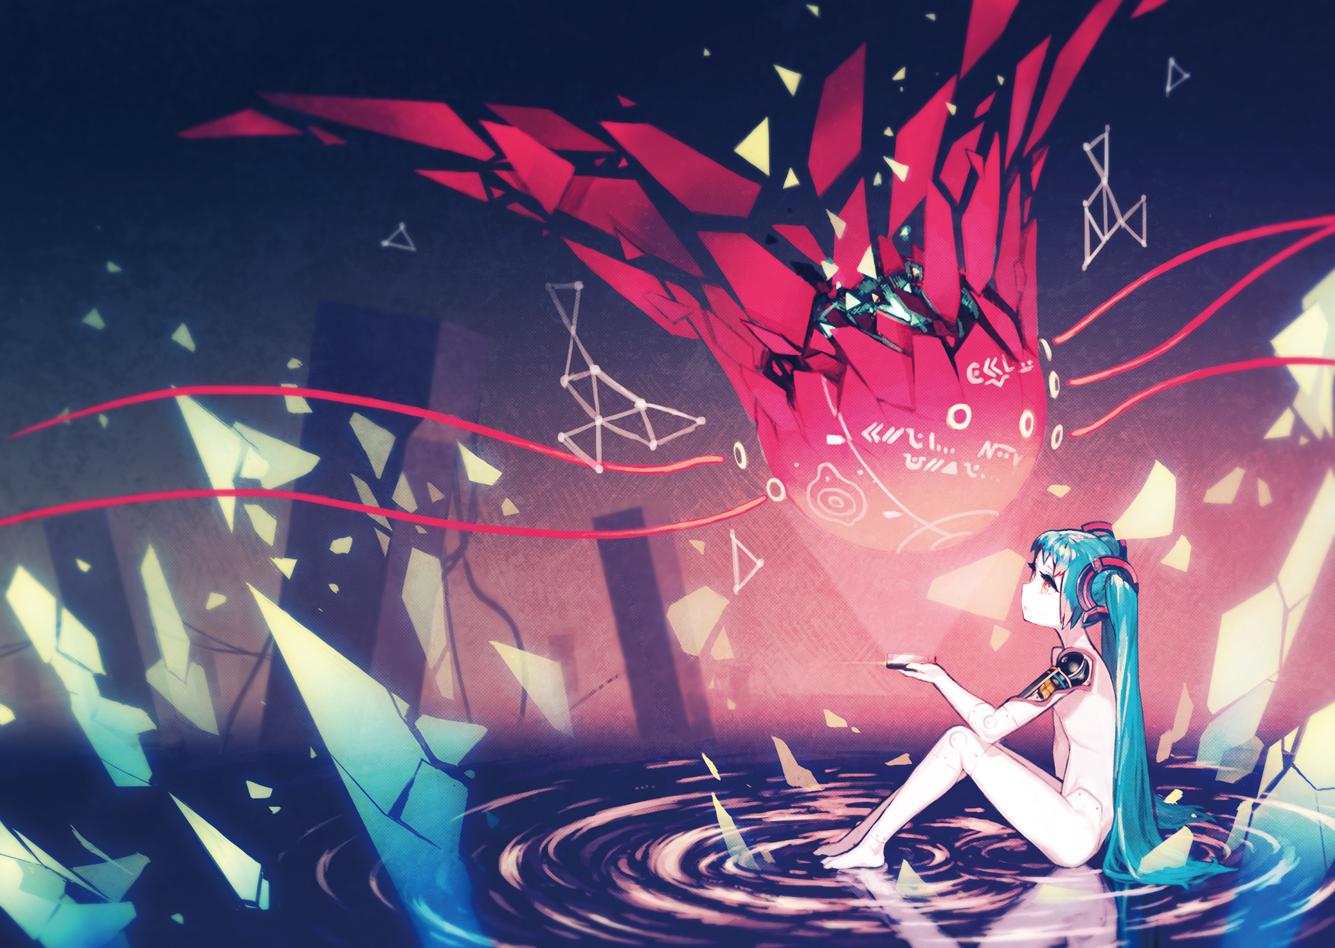 aqua_hair asgr hatsune_miku long_hair nude red_eyes techgirl twintails vocaloid water